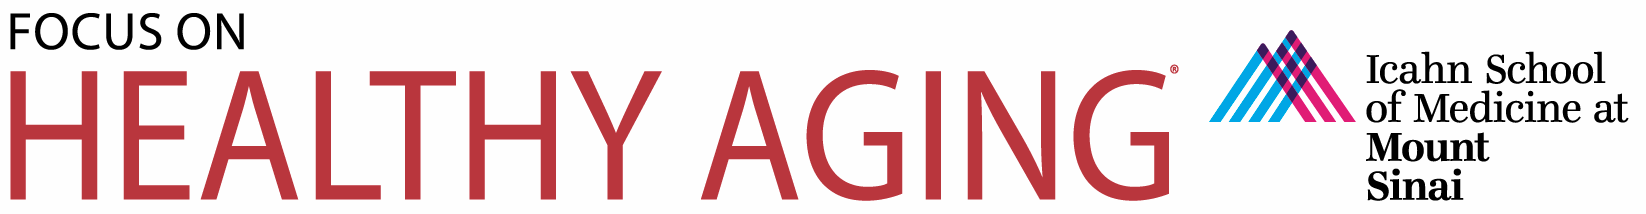 Mount Sinai School of Medicine Report on Alzheimer's Disease logo